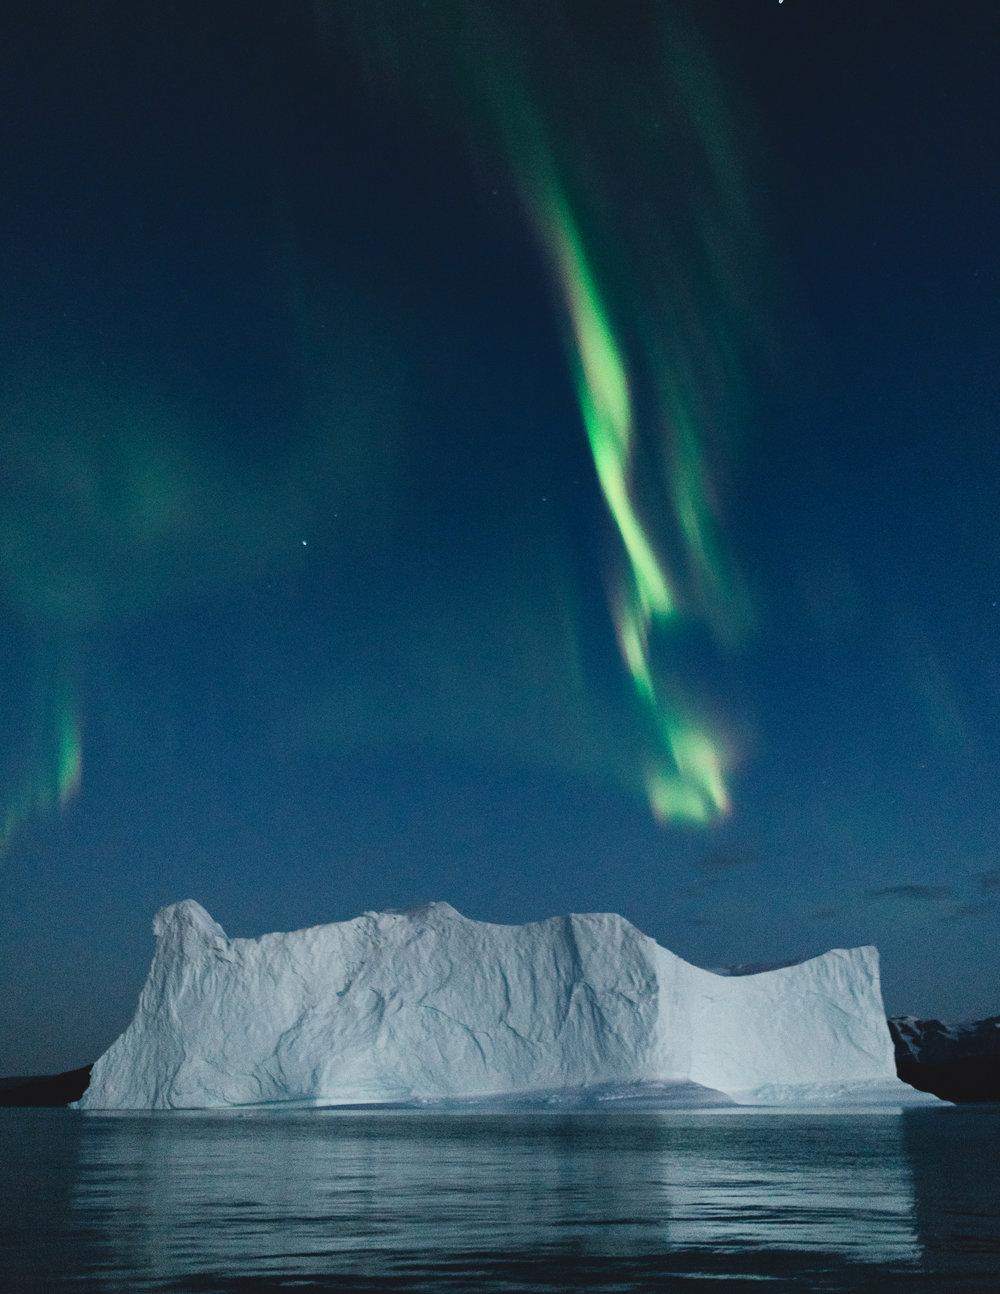 Aurora over iceberg: Northeast Greenland 2018